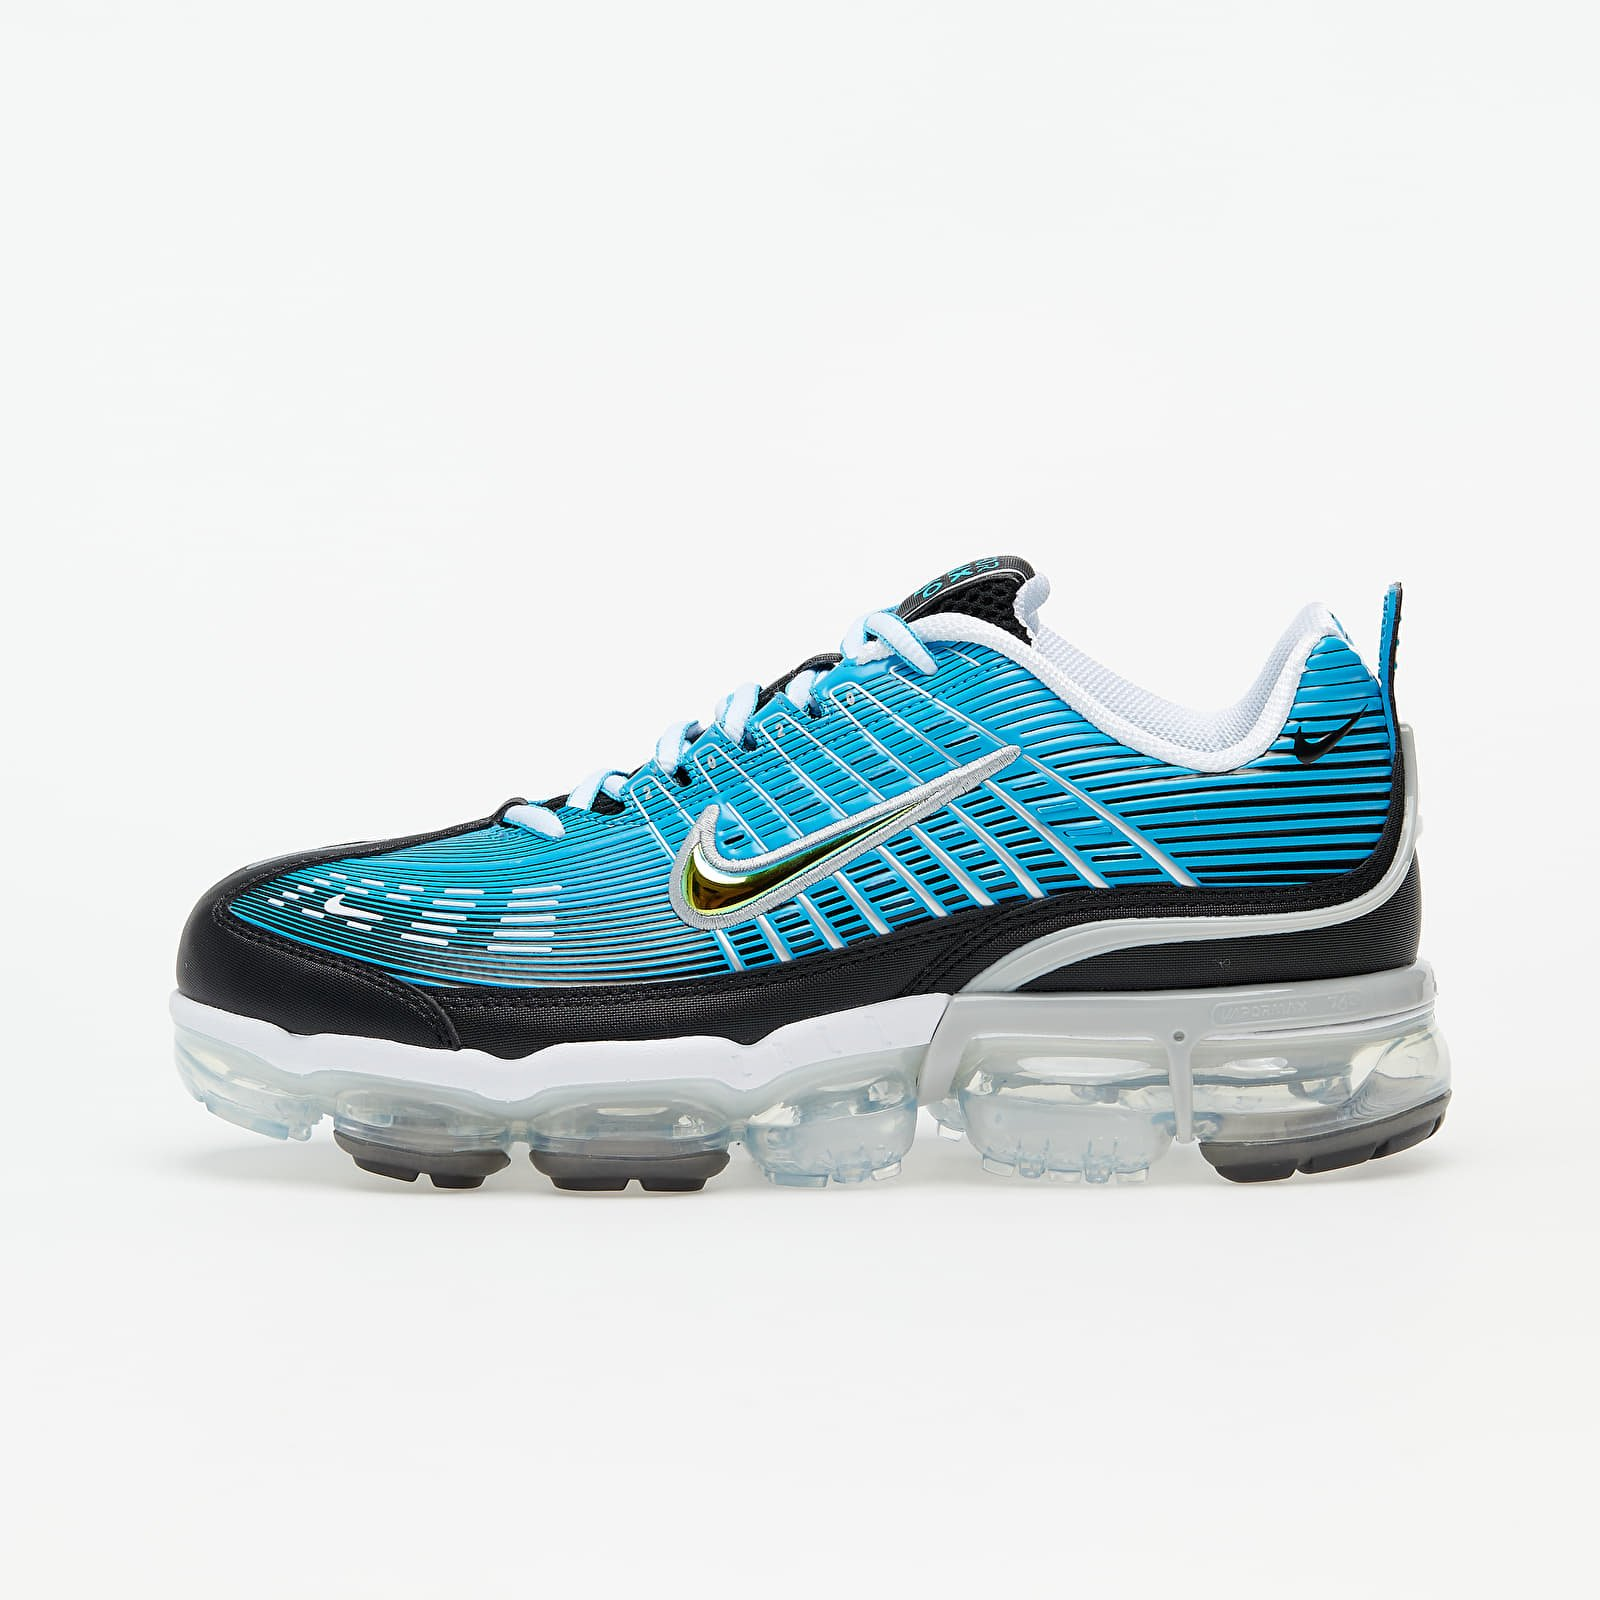 Men's shoes Nike Air Vapormax 360 Laser